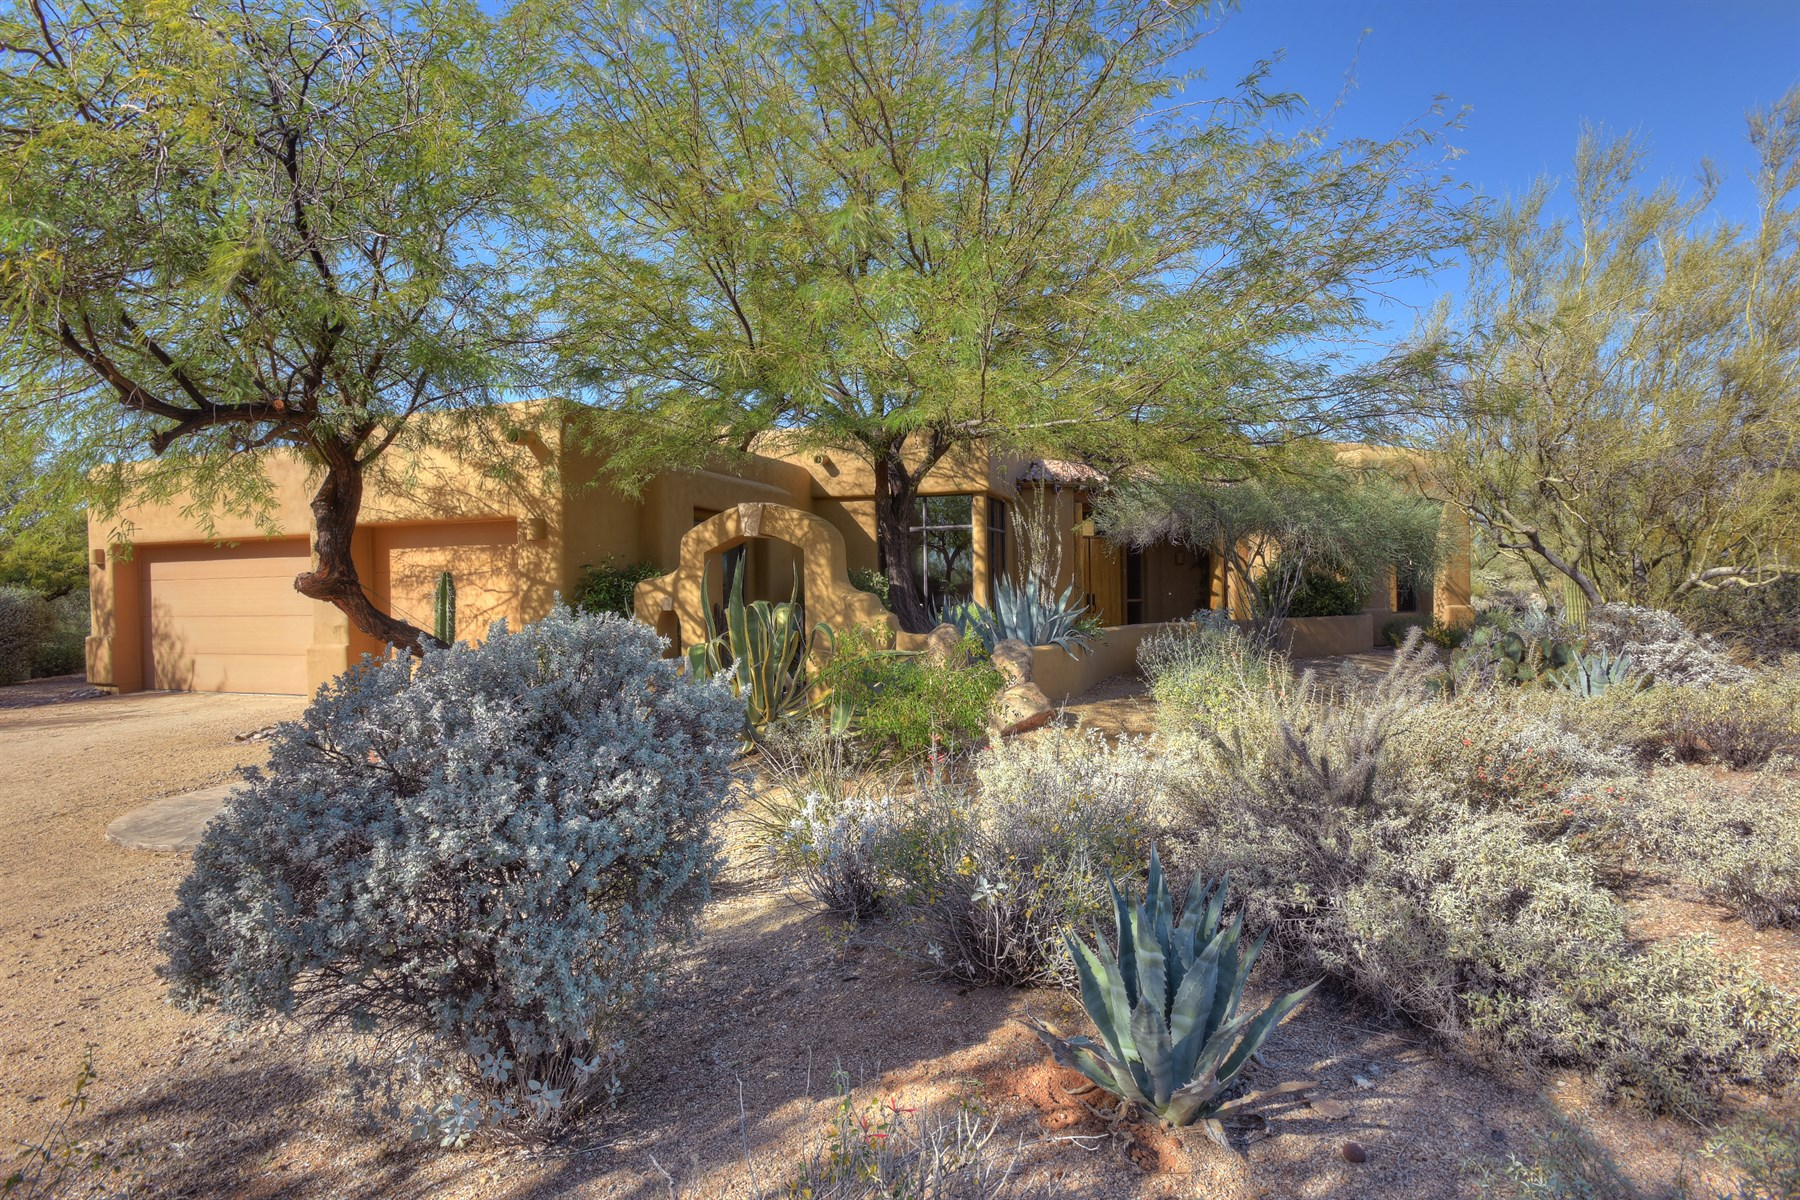 Casa para uma família para Venda às Exquisitely set at the base of Lone Mtn offering uncompromising views 8300 E Dixileta Dr 259 Scottsdale, Arizona 85266 Estados Unidos